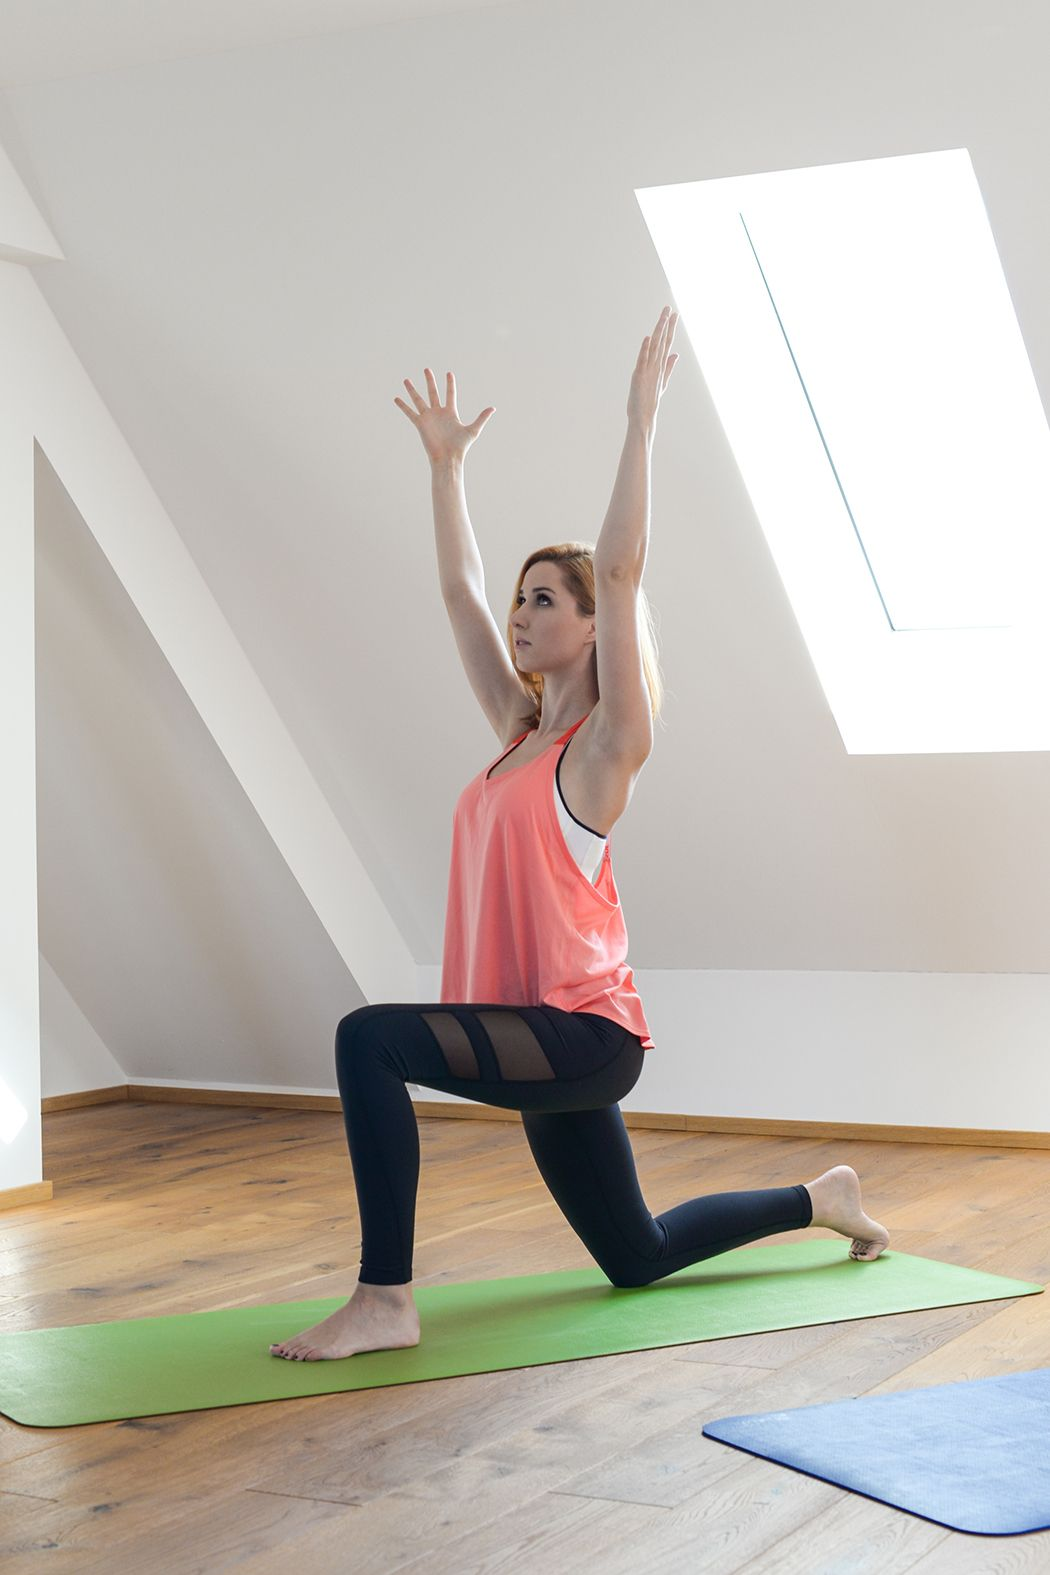 Yoga für Anfänger mit Calyana Yoga anfänger, Yoga, Fitness